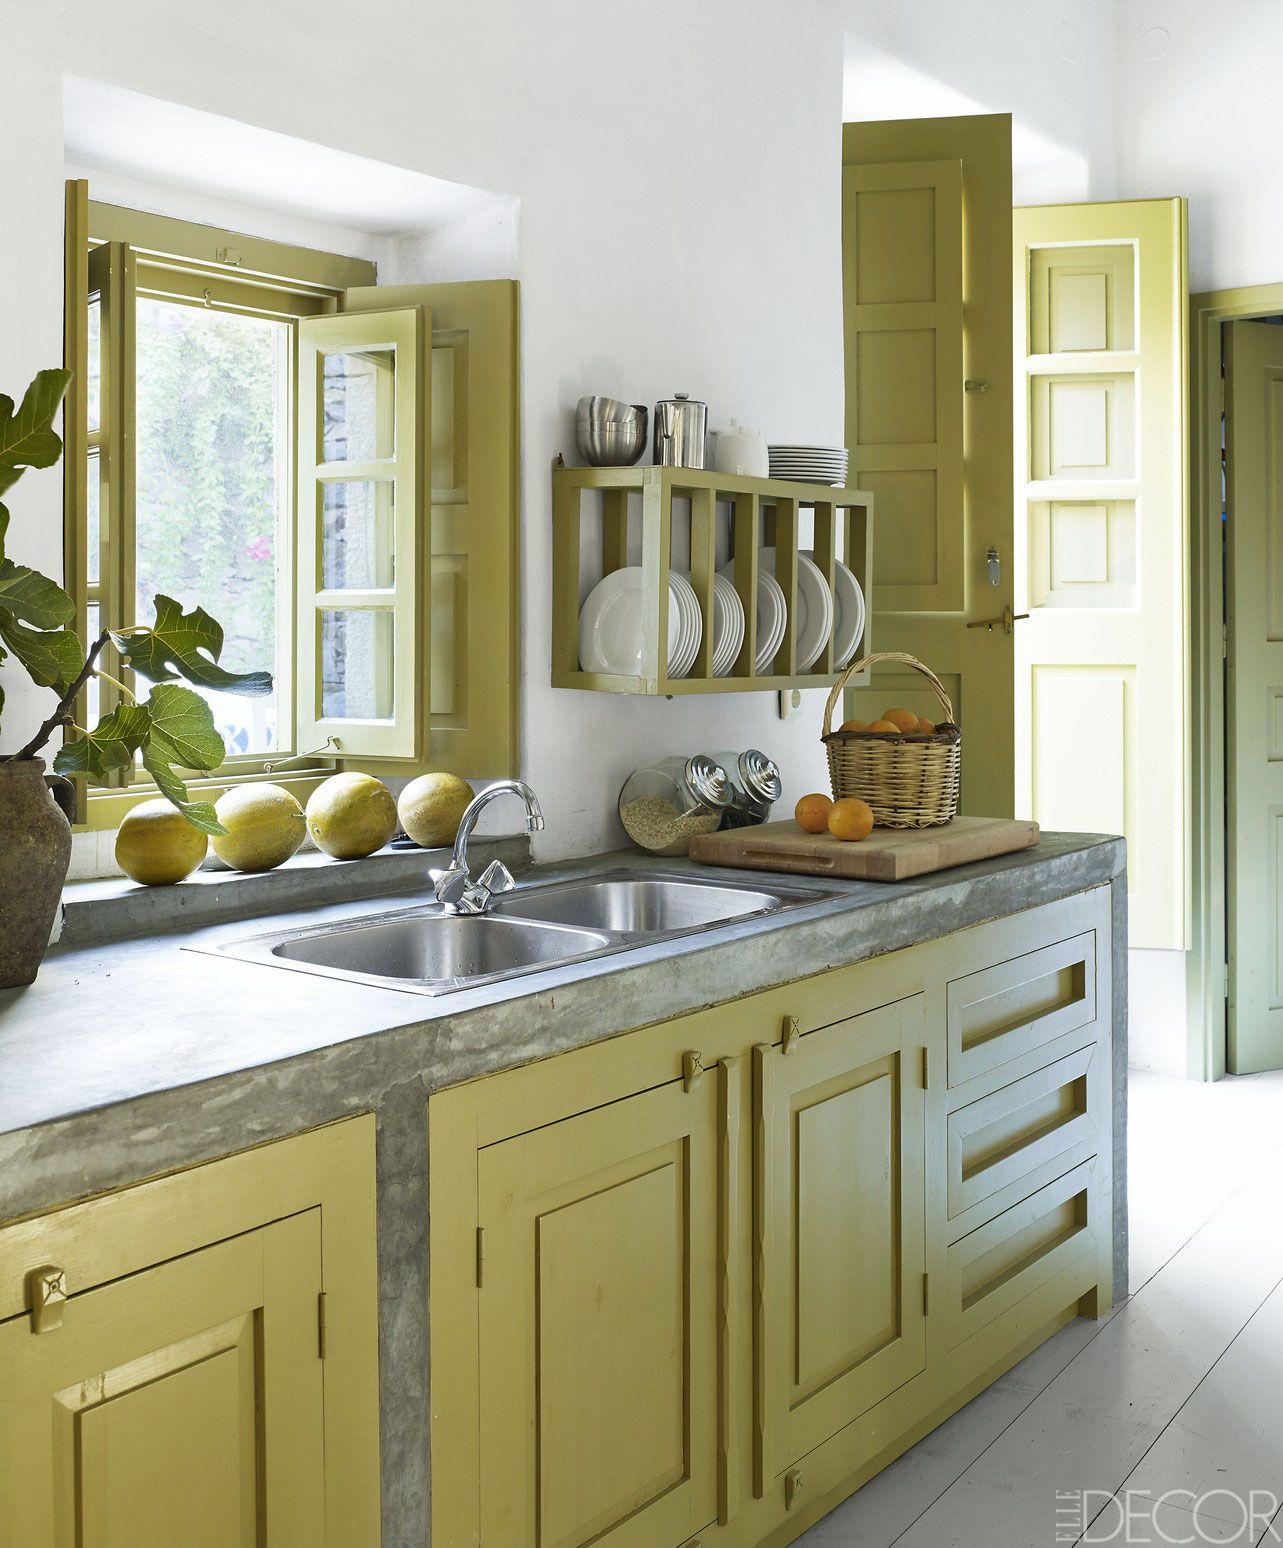 Low Cost Simple Kitchen Designs : simple, kitchen, designs, Small, Kitchen, Ideas, Brilliant, Space, Hacks, Kitchens